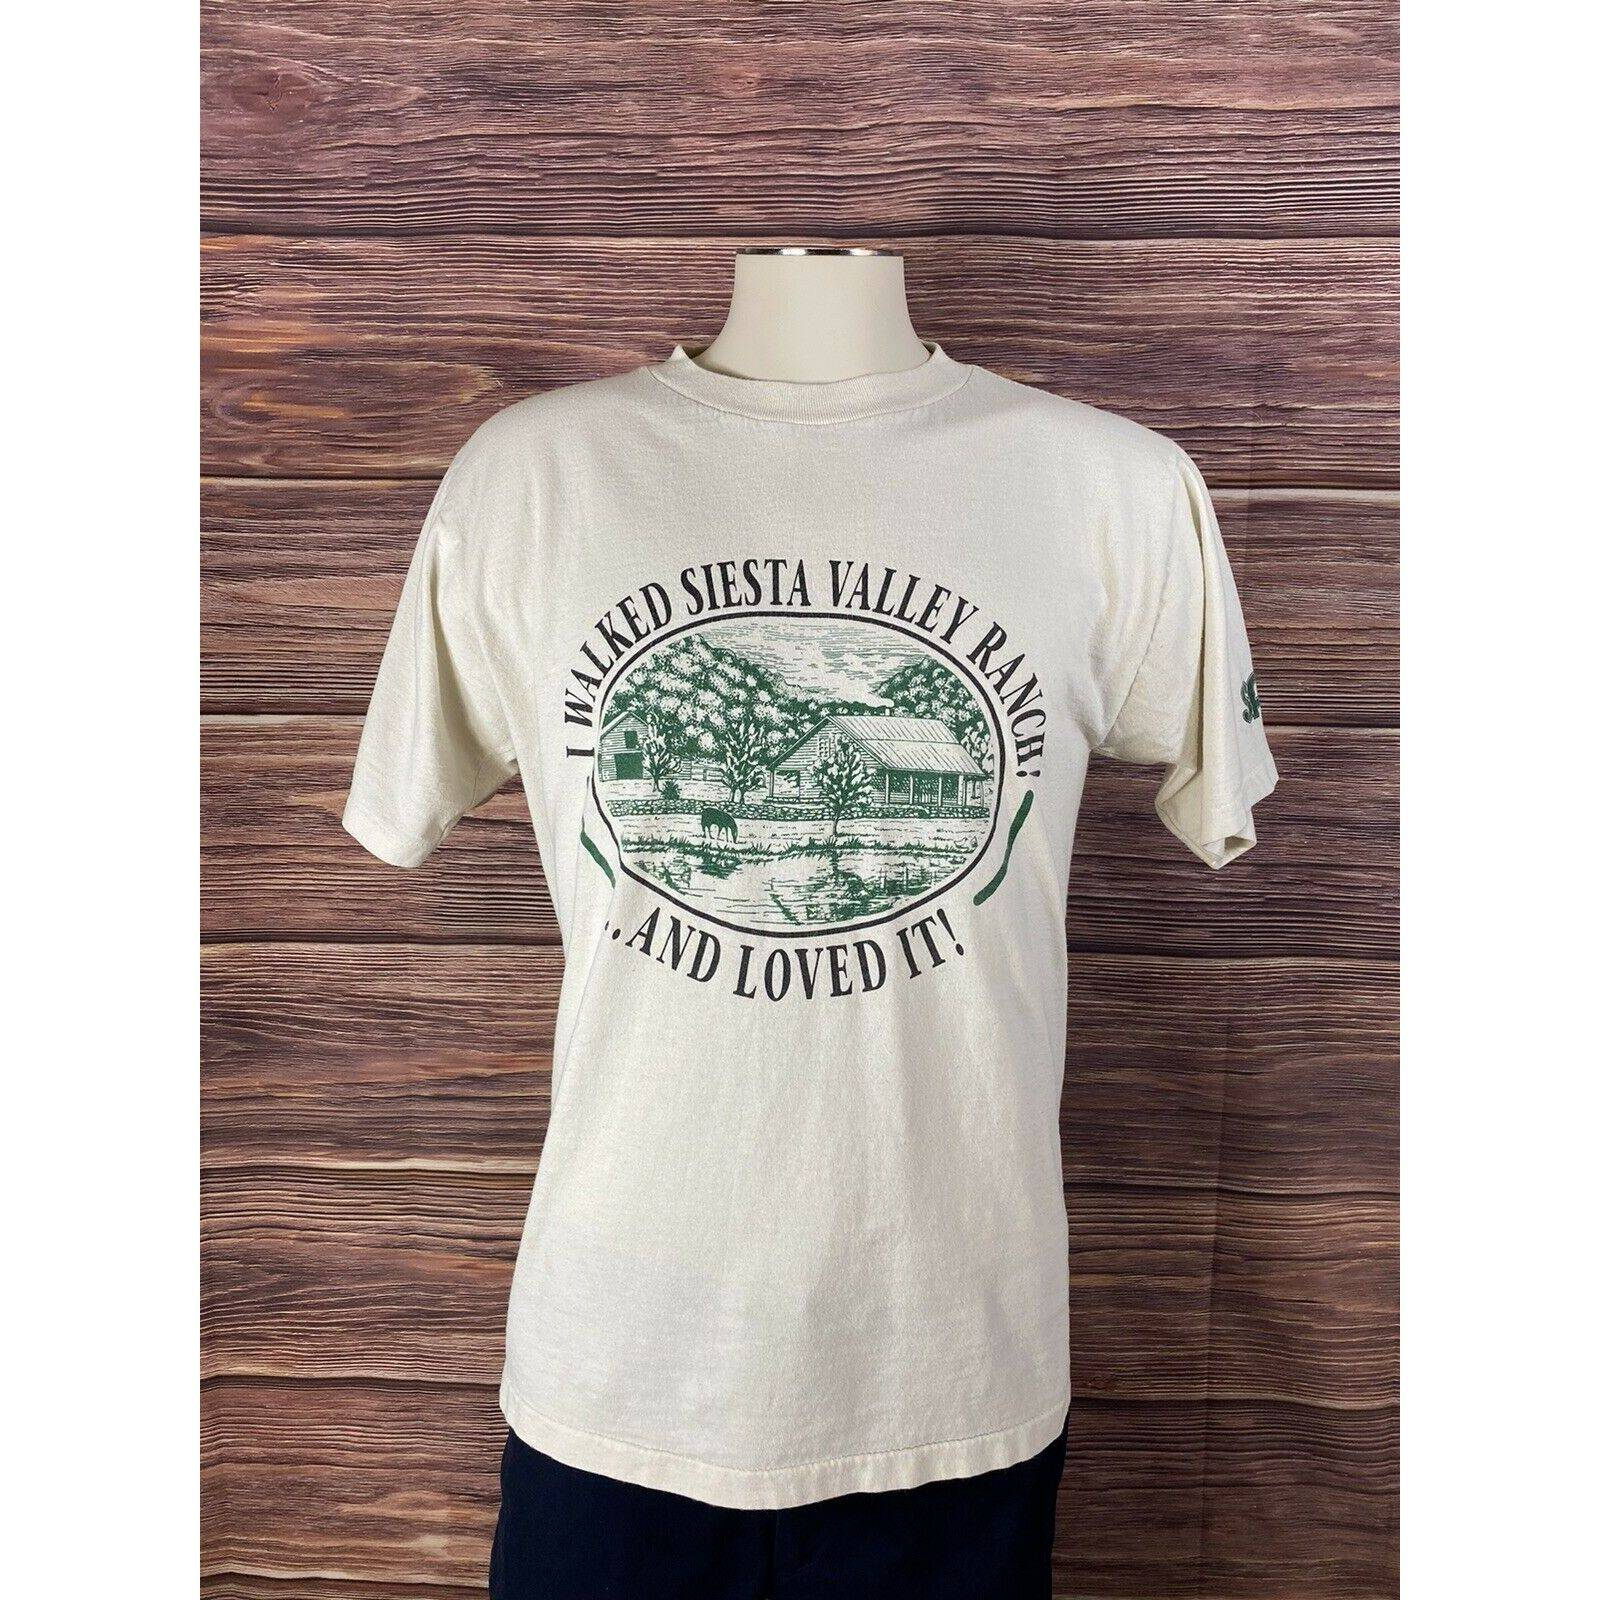 Men's Siesta Valley Ranch T-shirt